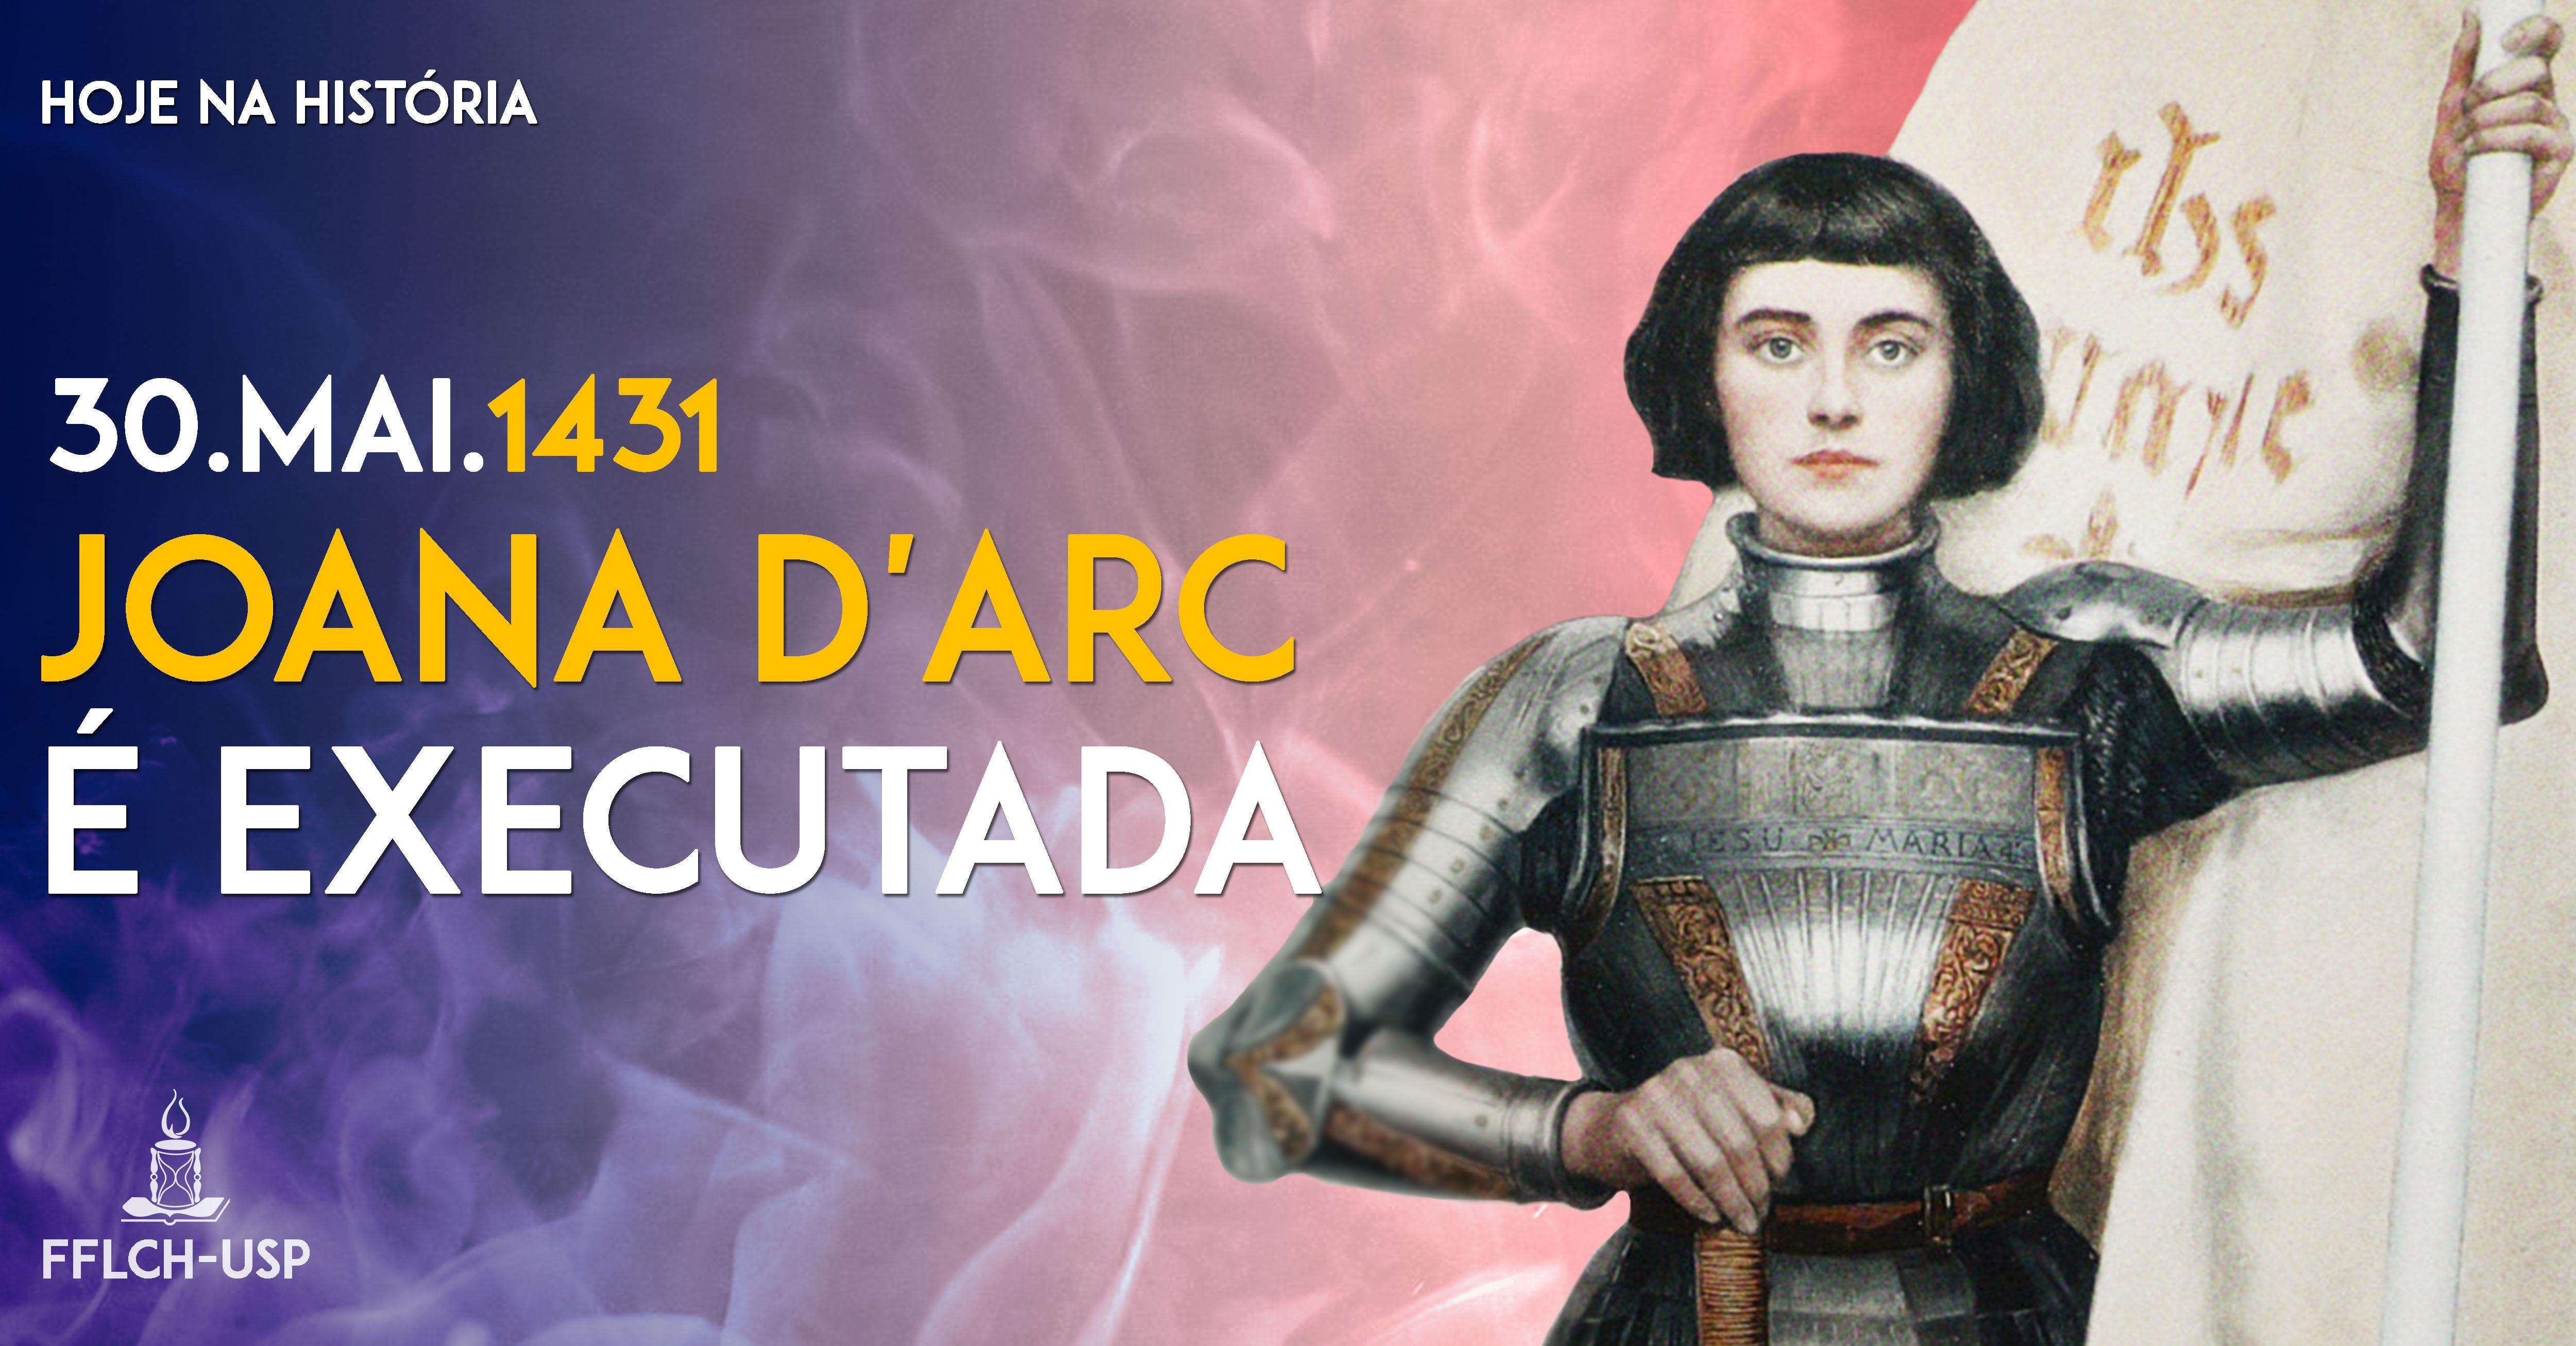 Joana d Arc é executada pela Igreja Católica (Arte  Renan Braz) 38db8c4289d5d